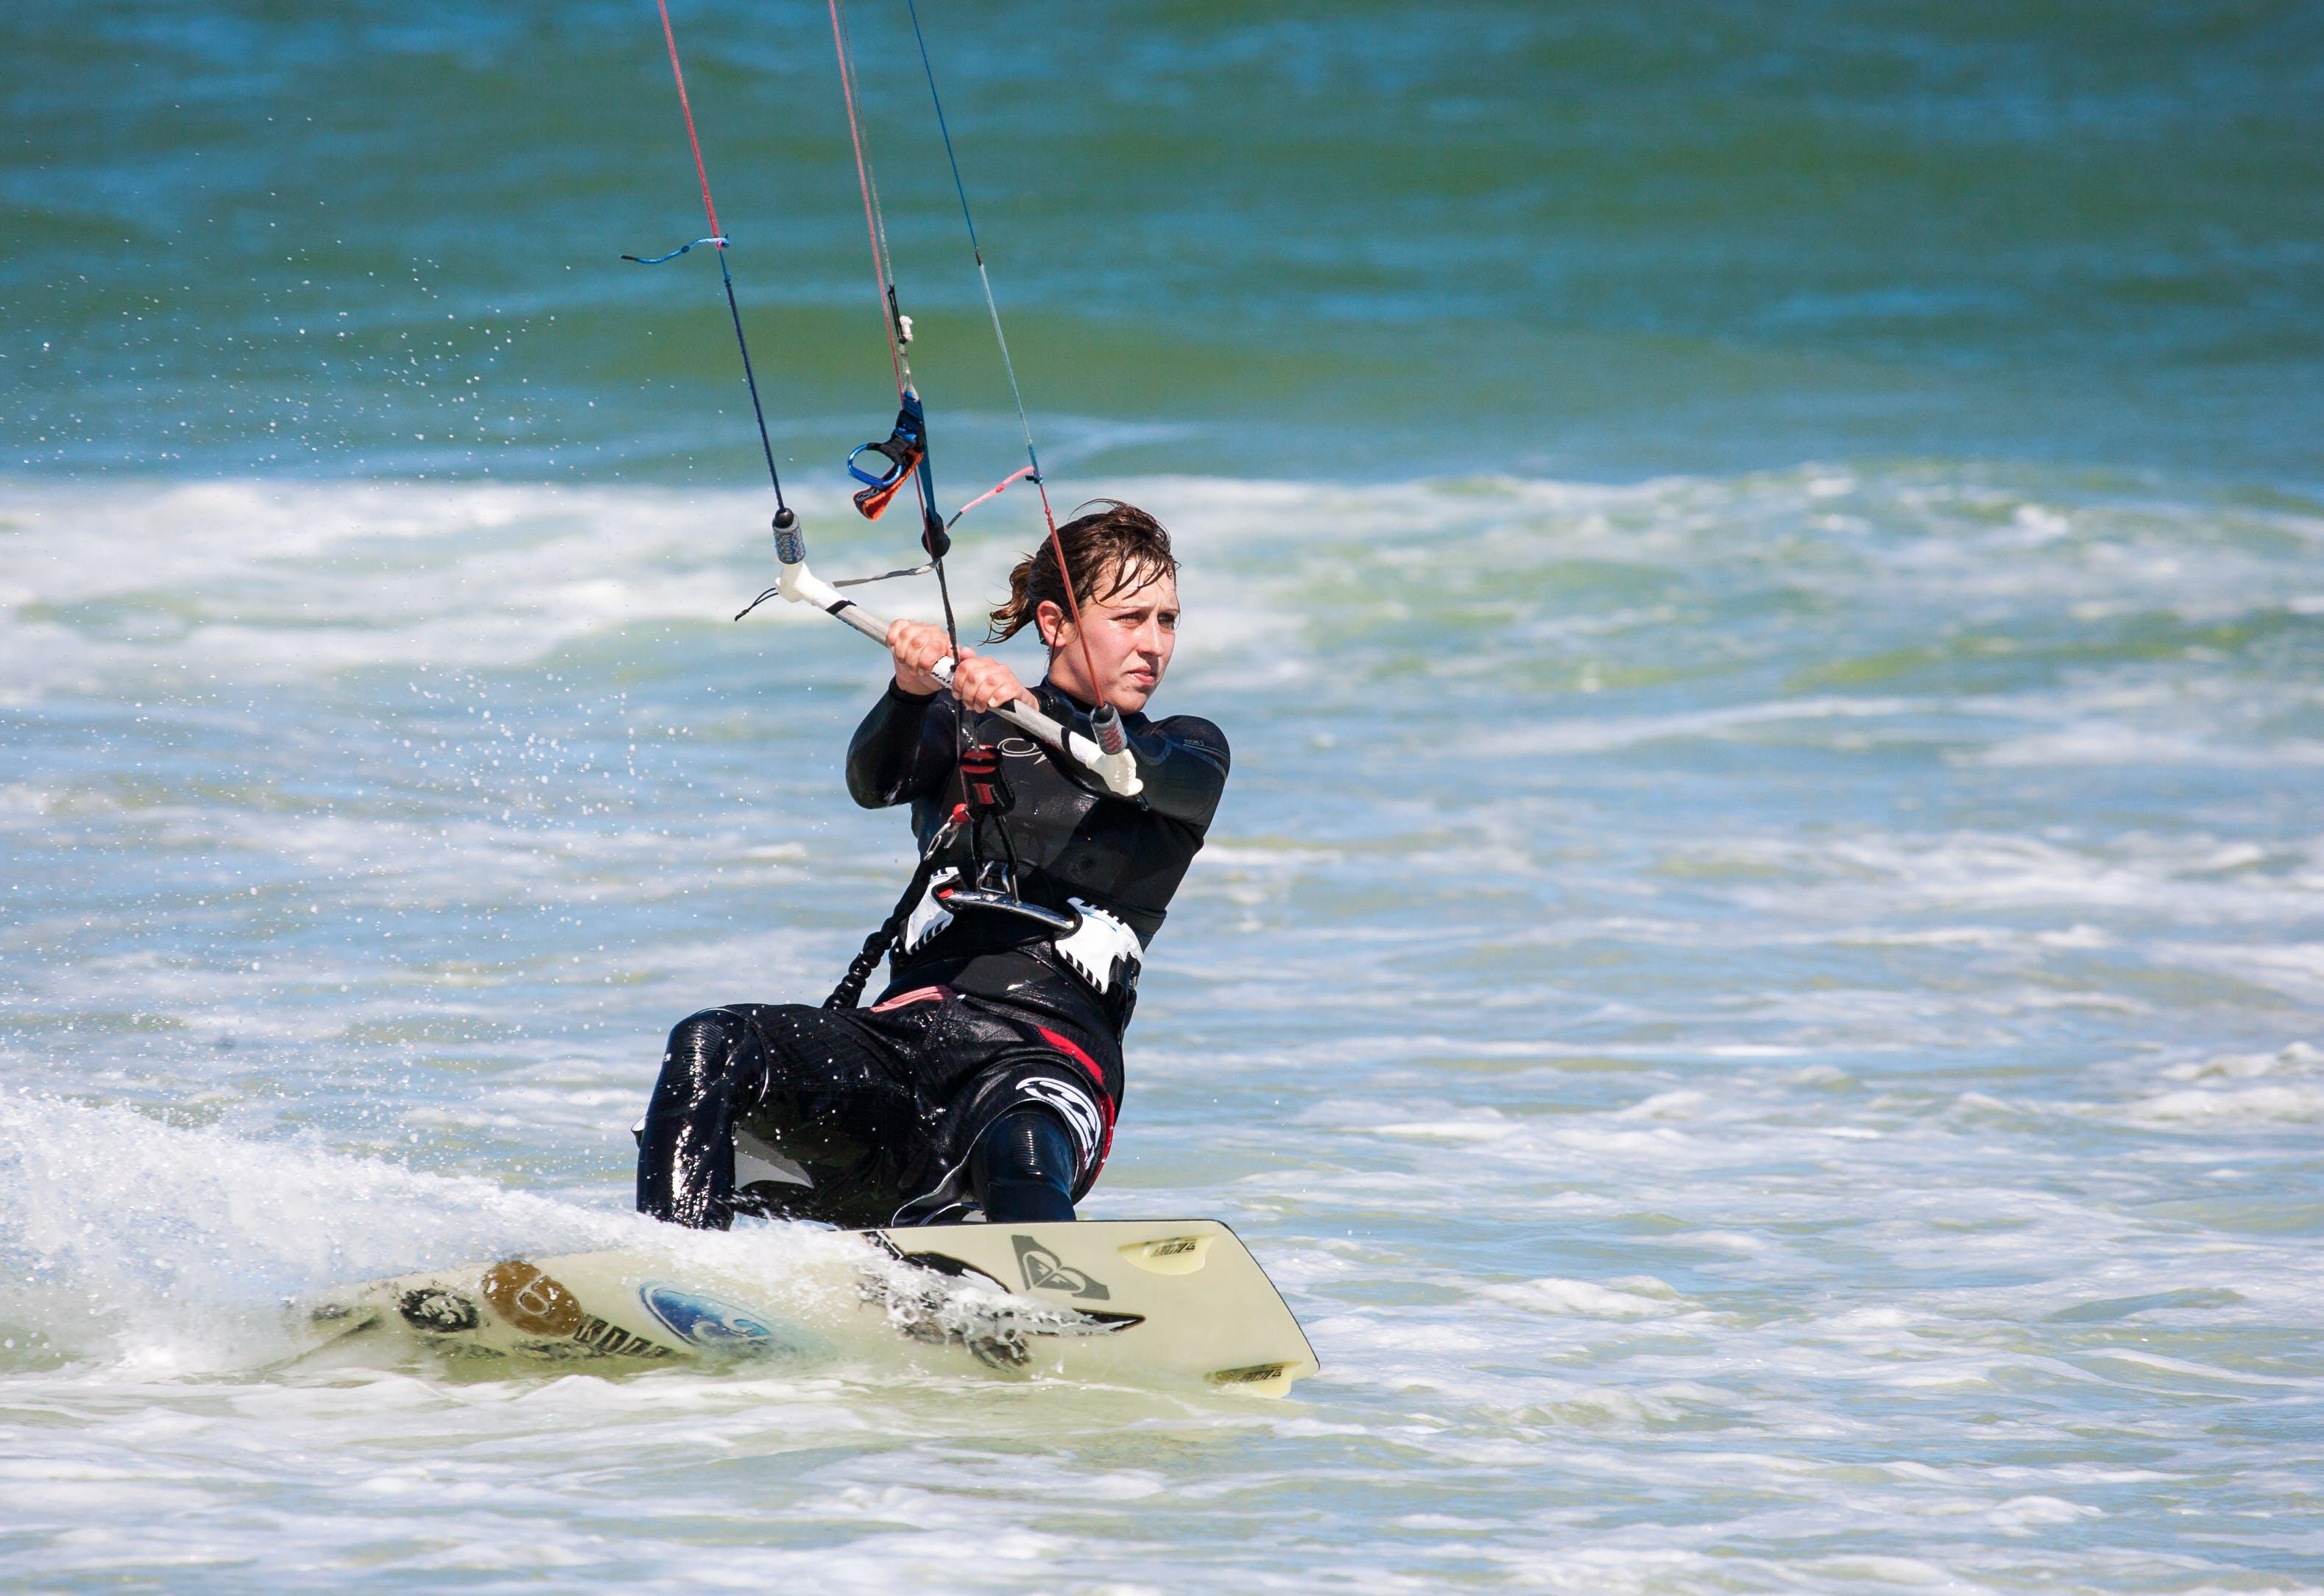 Kitesurfer on Body of Water